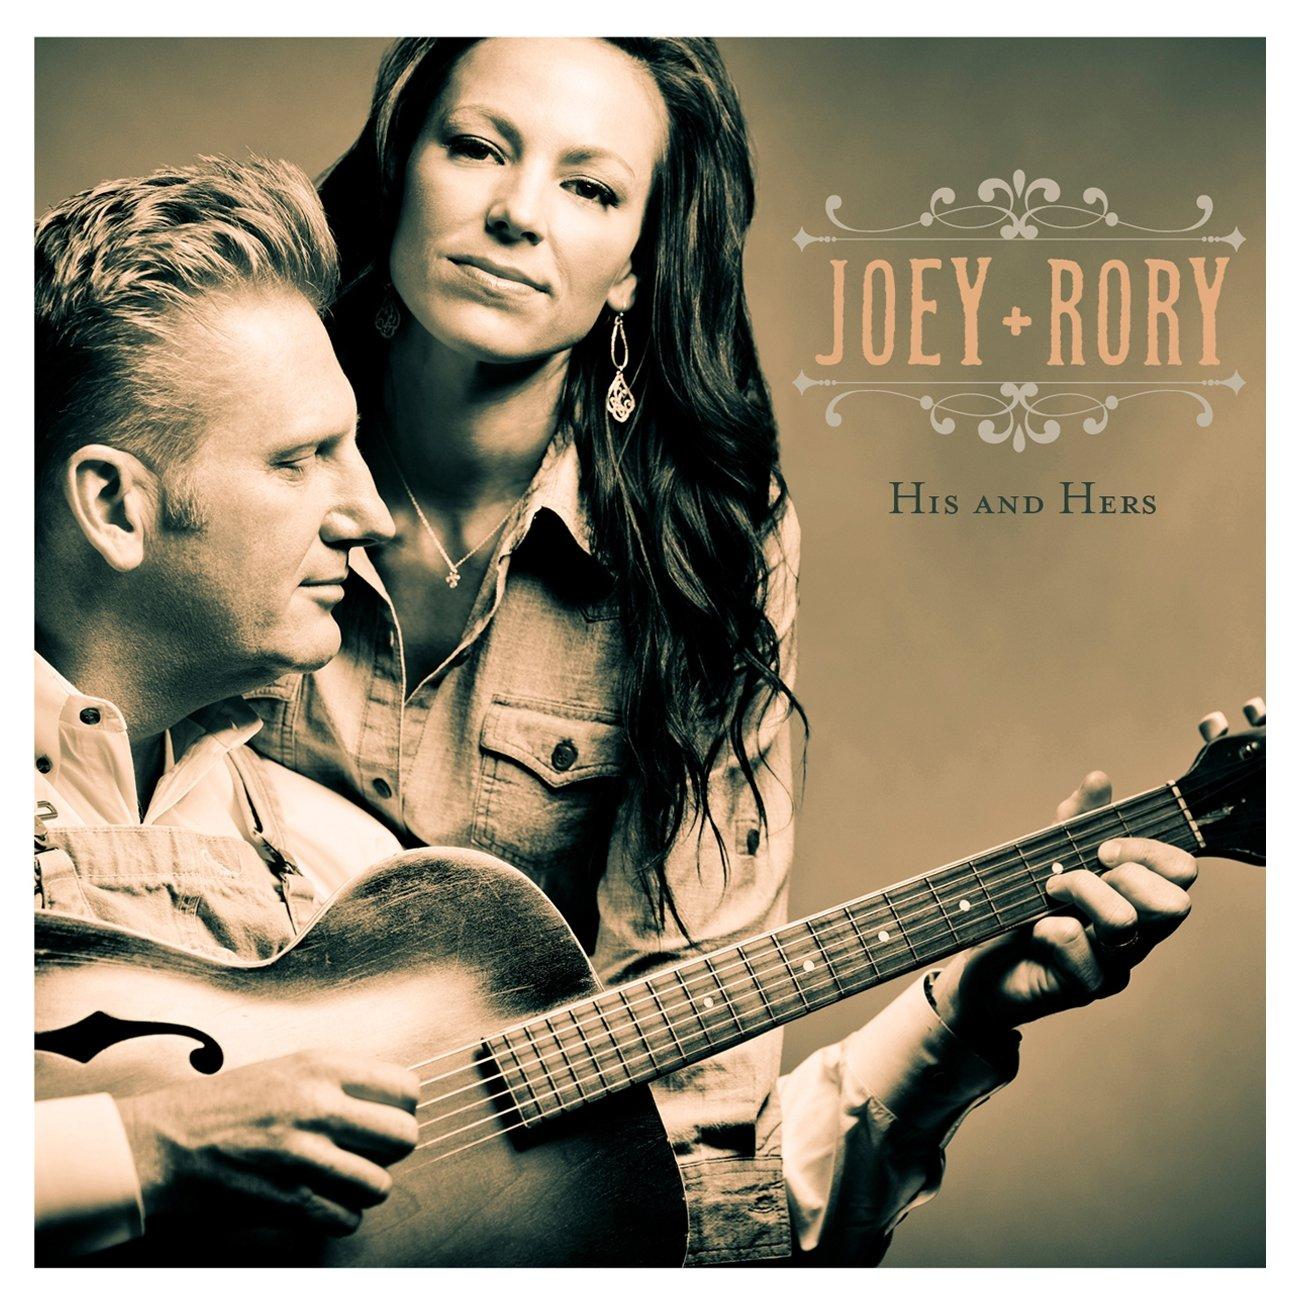 Joey and Rory Cd: Amazon.com